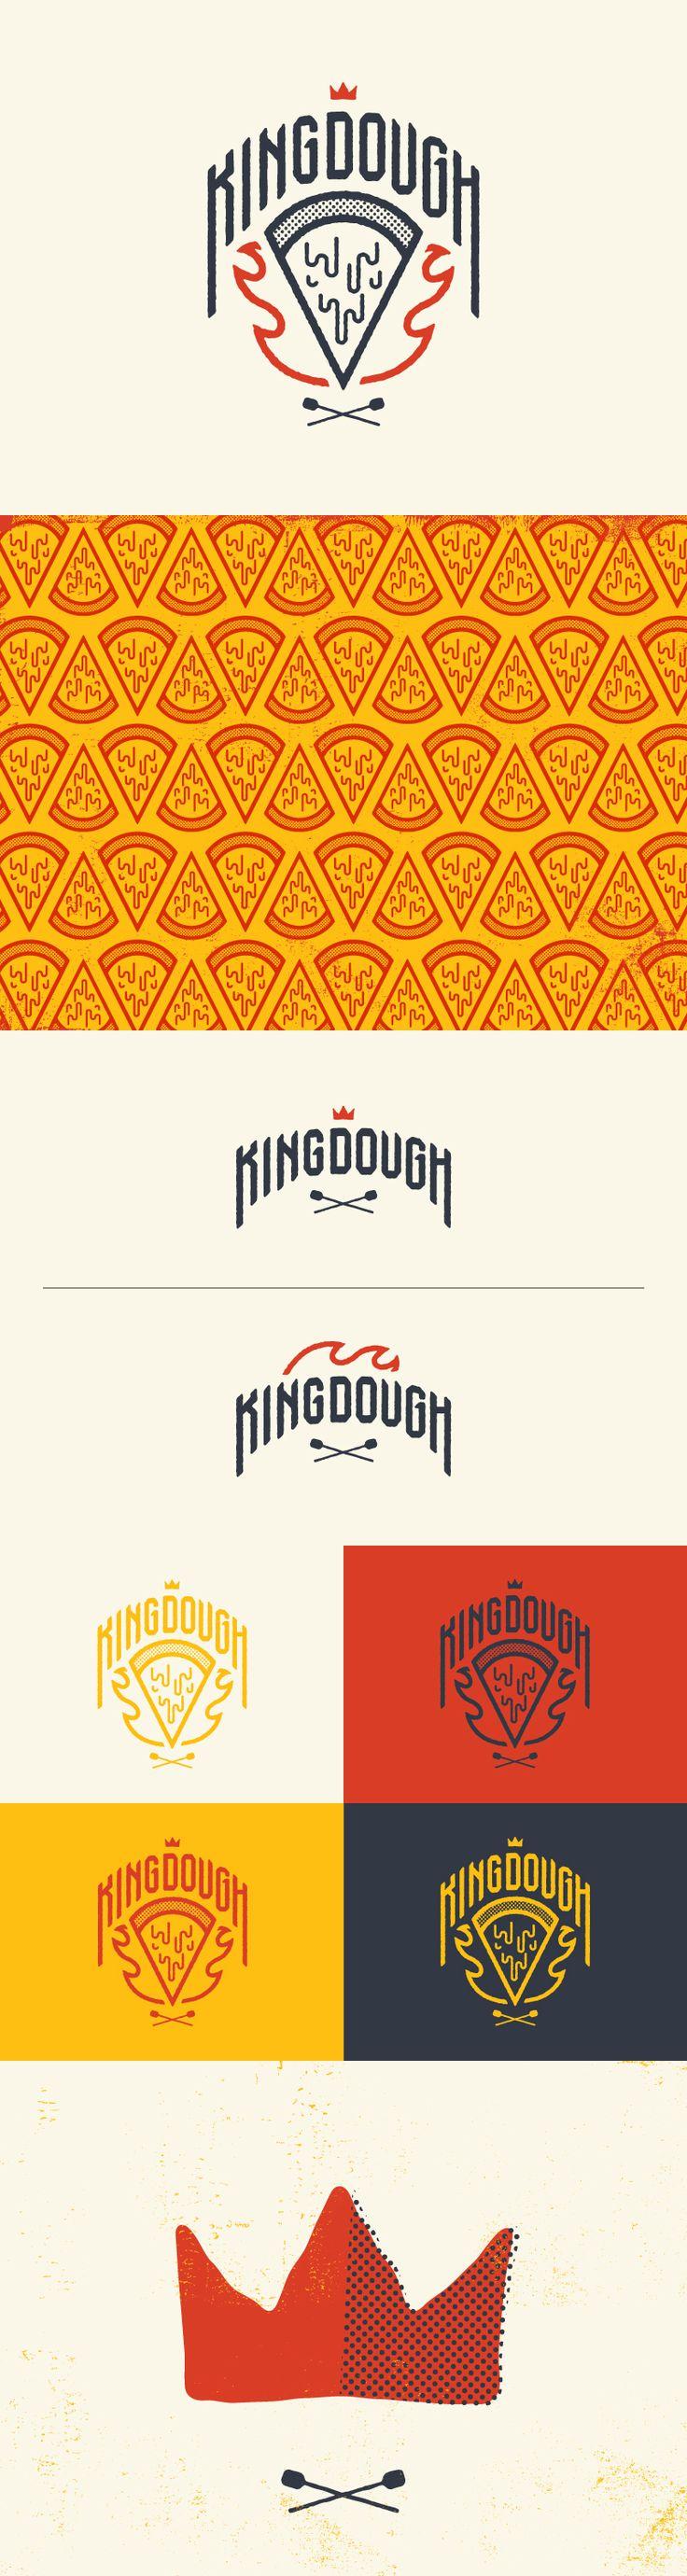 King Dough by Zach Graham